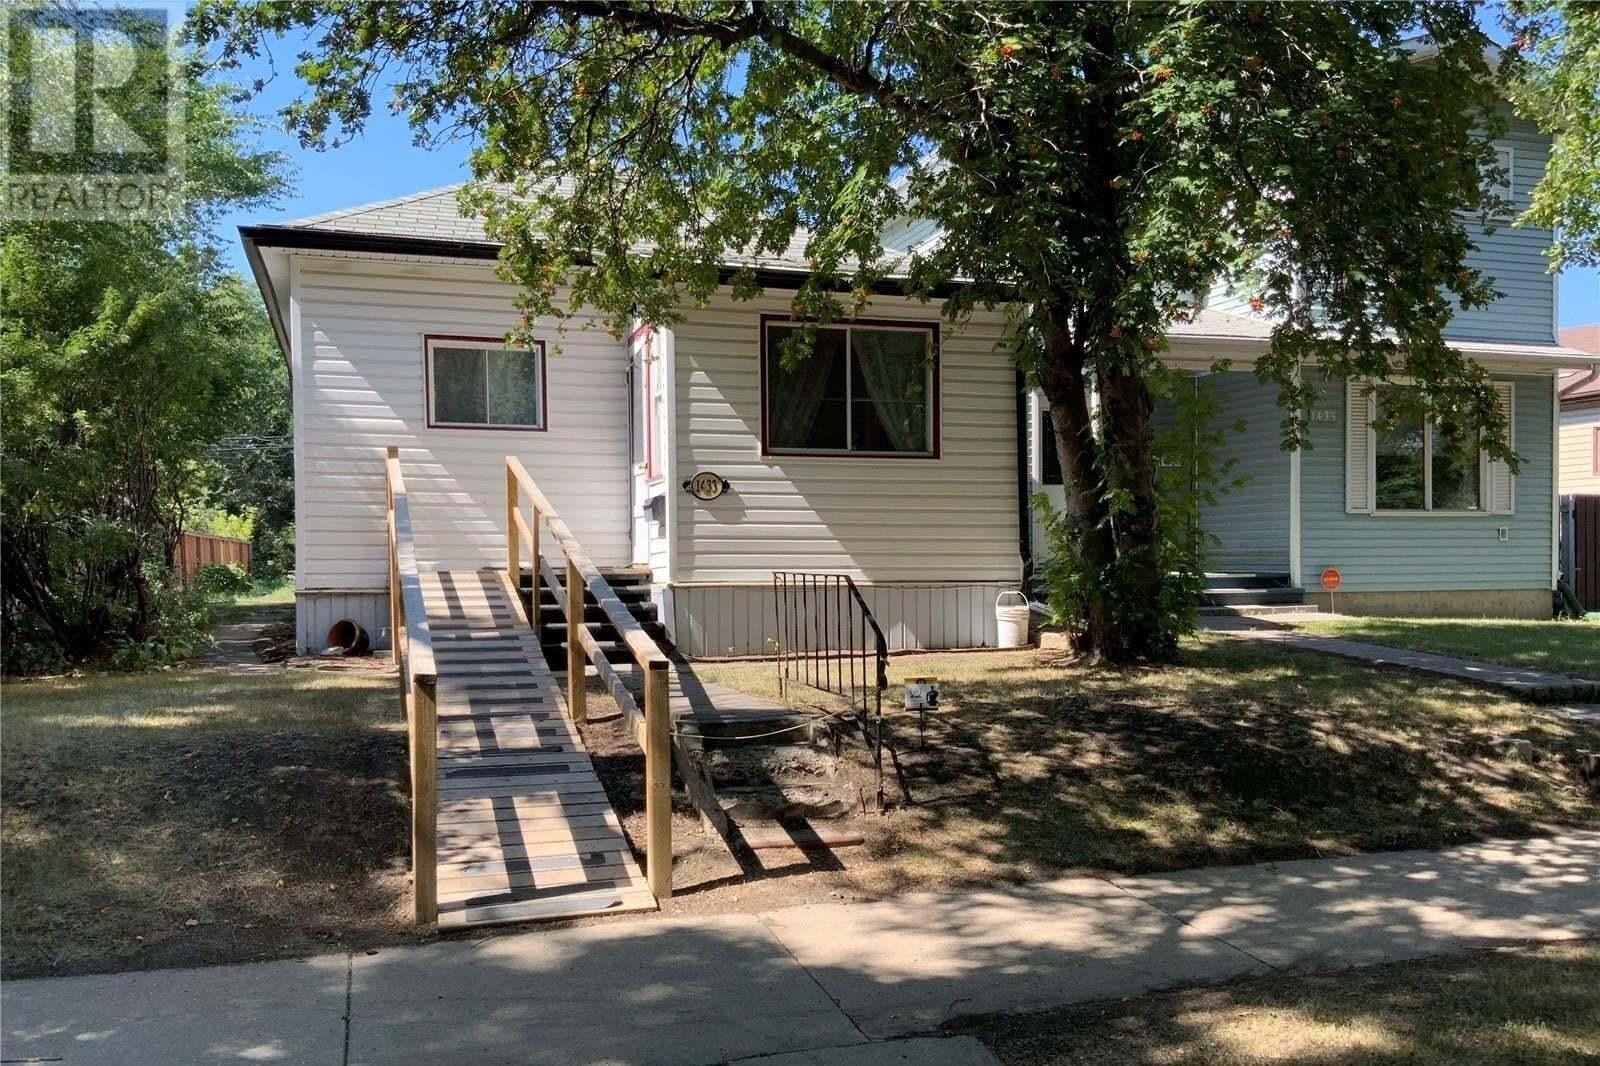 House for sale at 1433 B Ave N Saskatoon Saskatchewan - MLS: SK823594